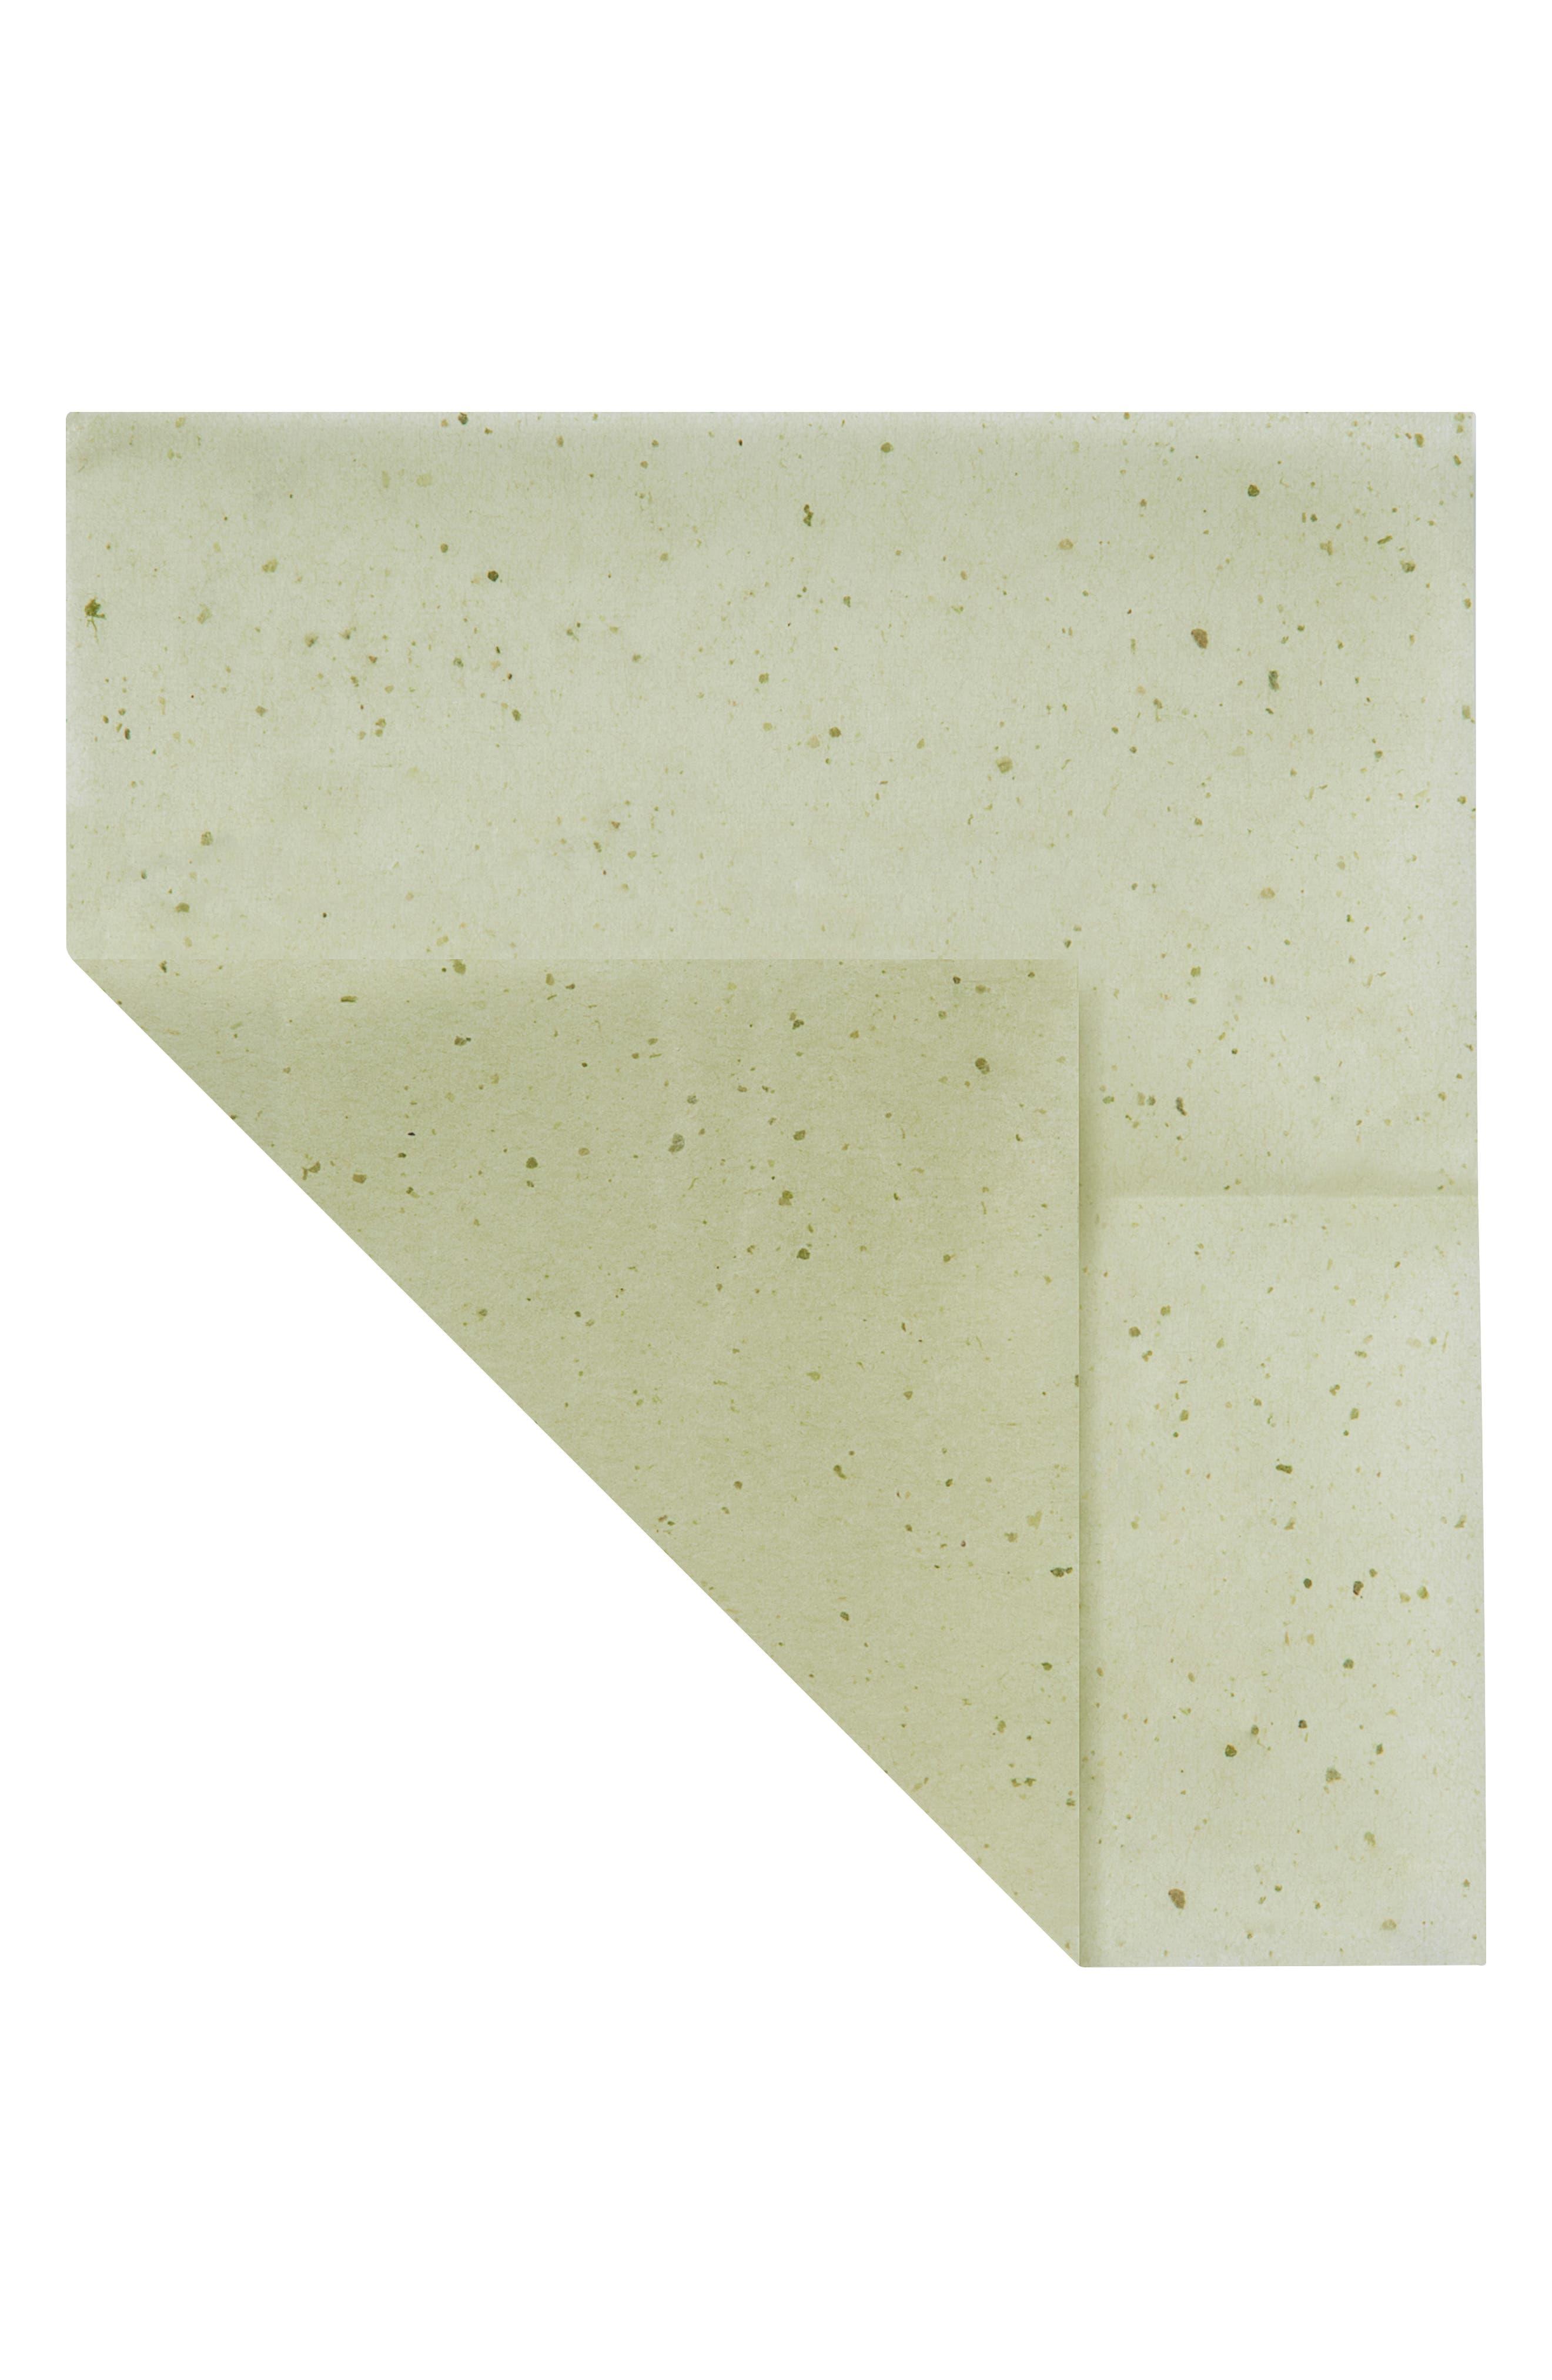 Green Tea Blotting Linens,                             Alternate thumbnail 2, color,                             000